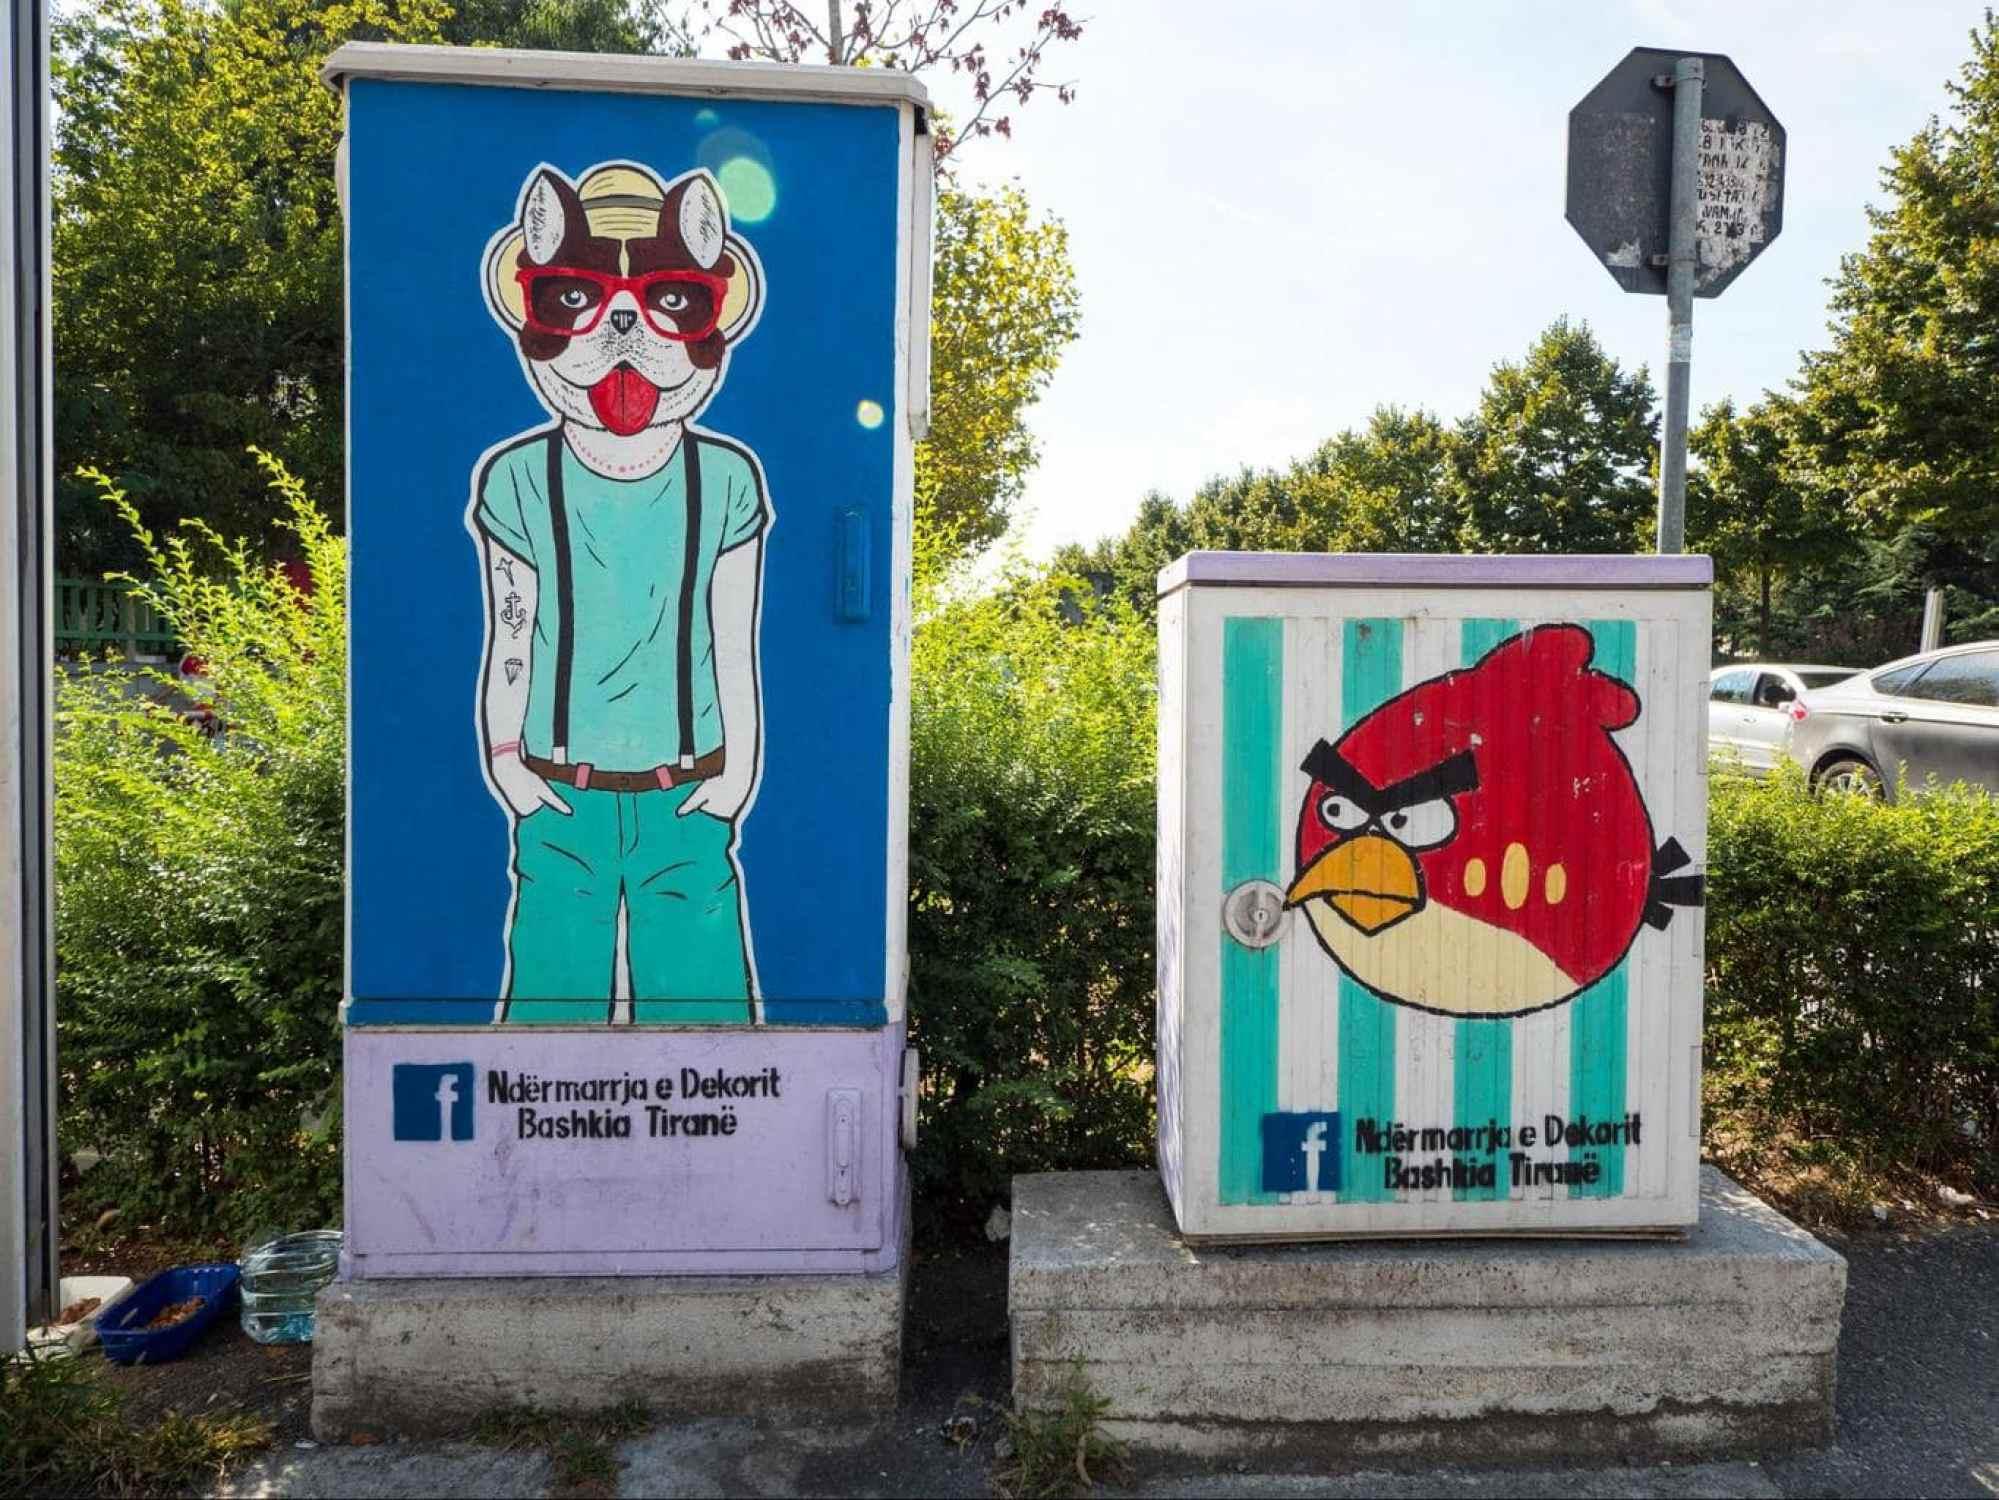 Electric box street art in Tirana